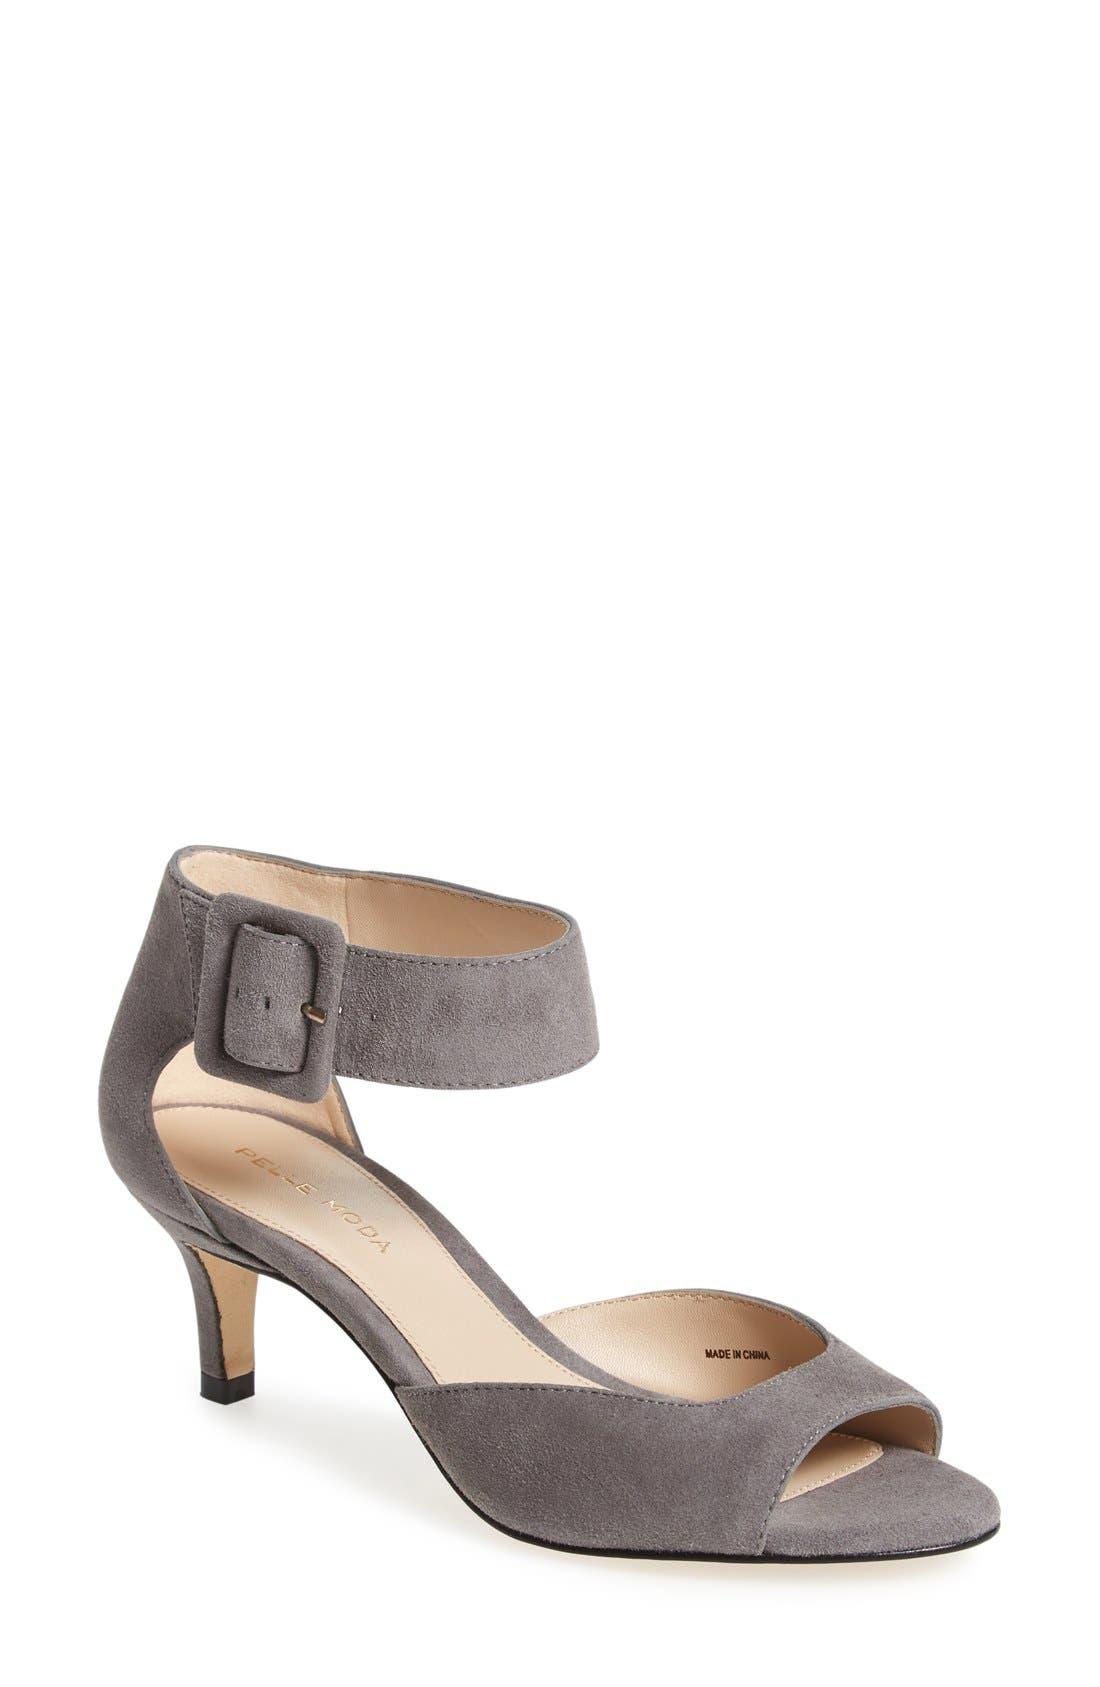 'Berlin' Ankle Strap Sandal,                             Main thumbnail 9, color,